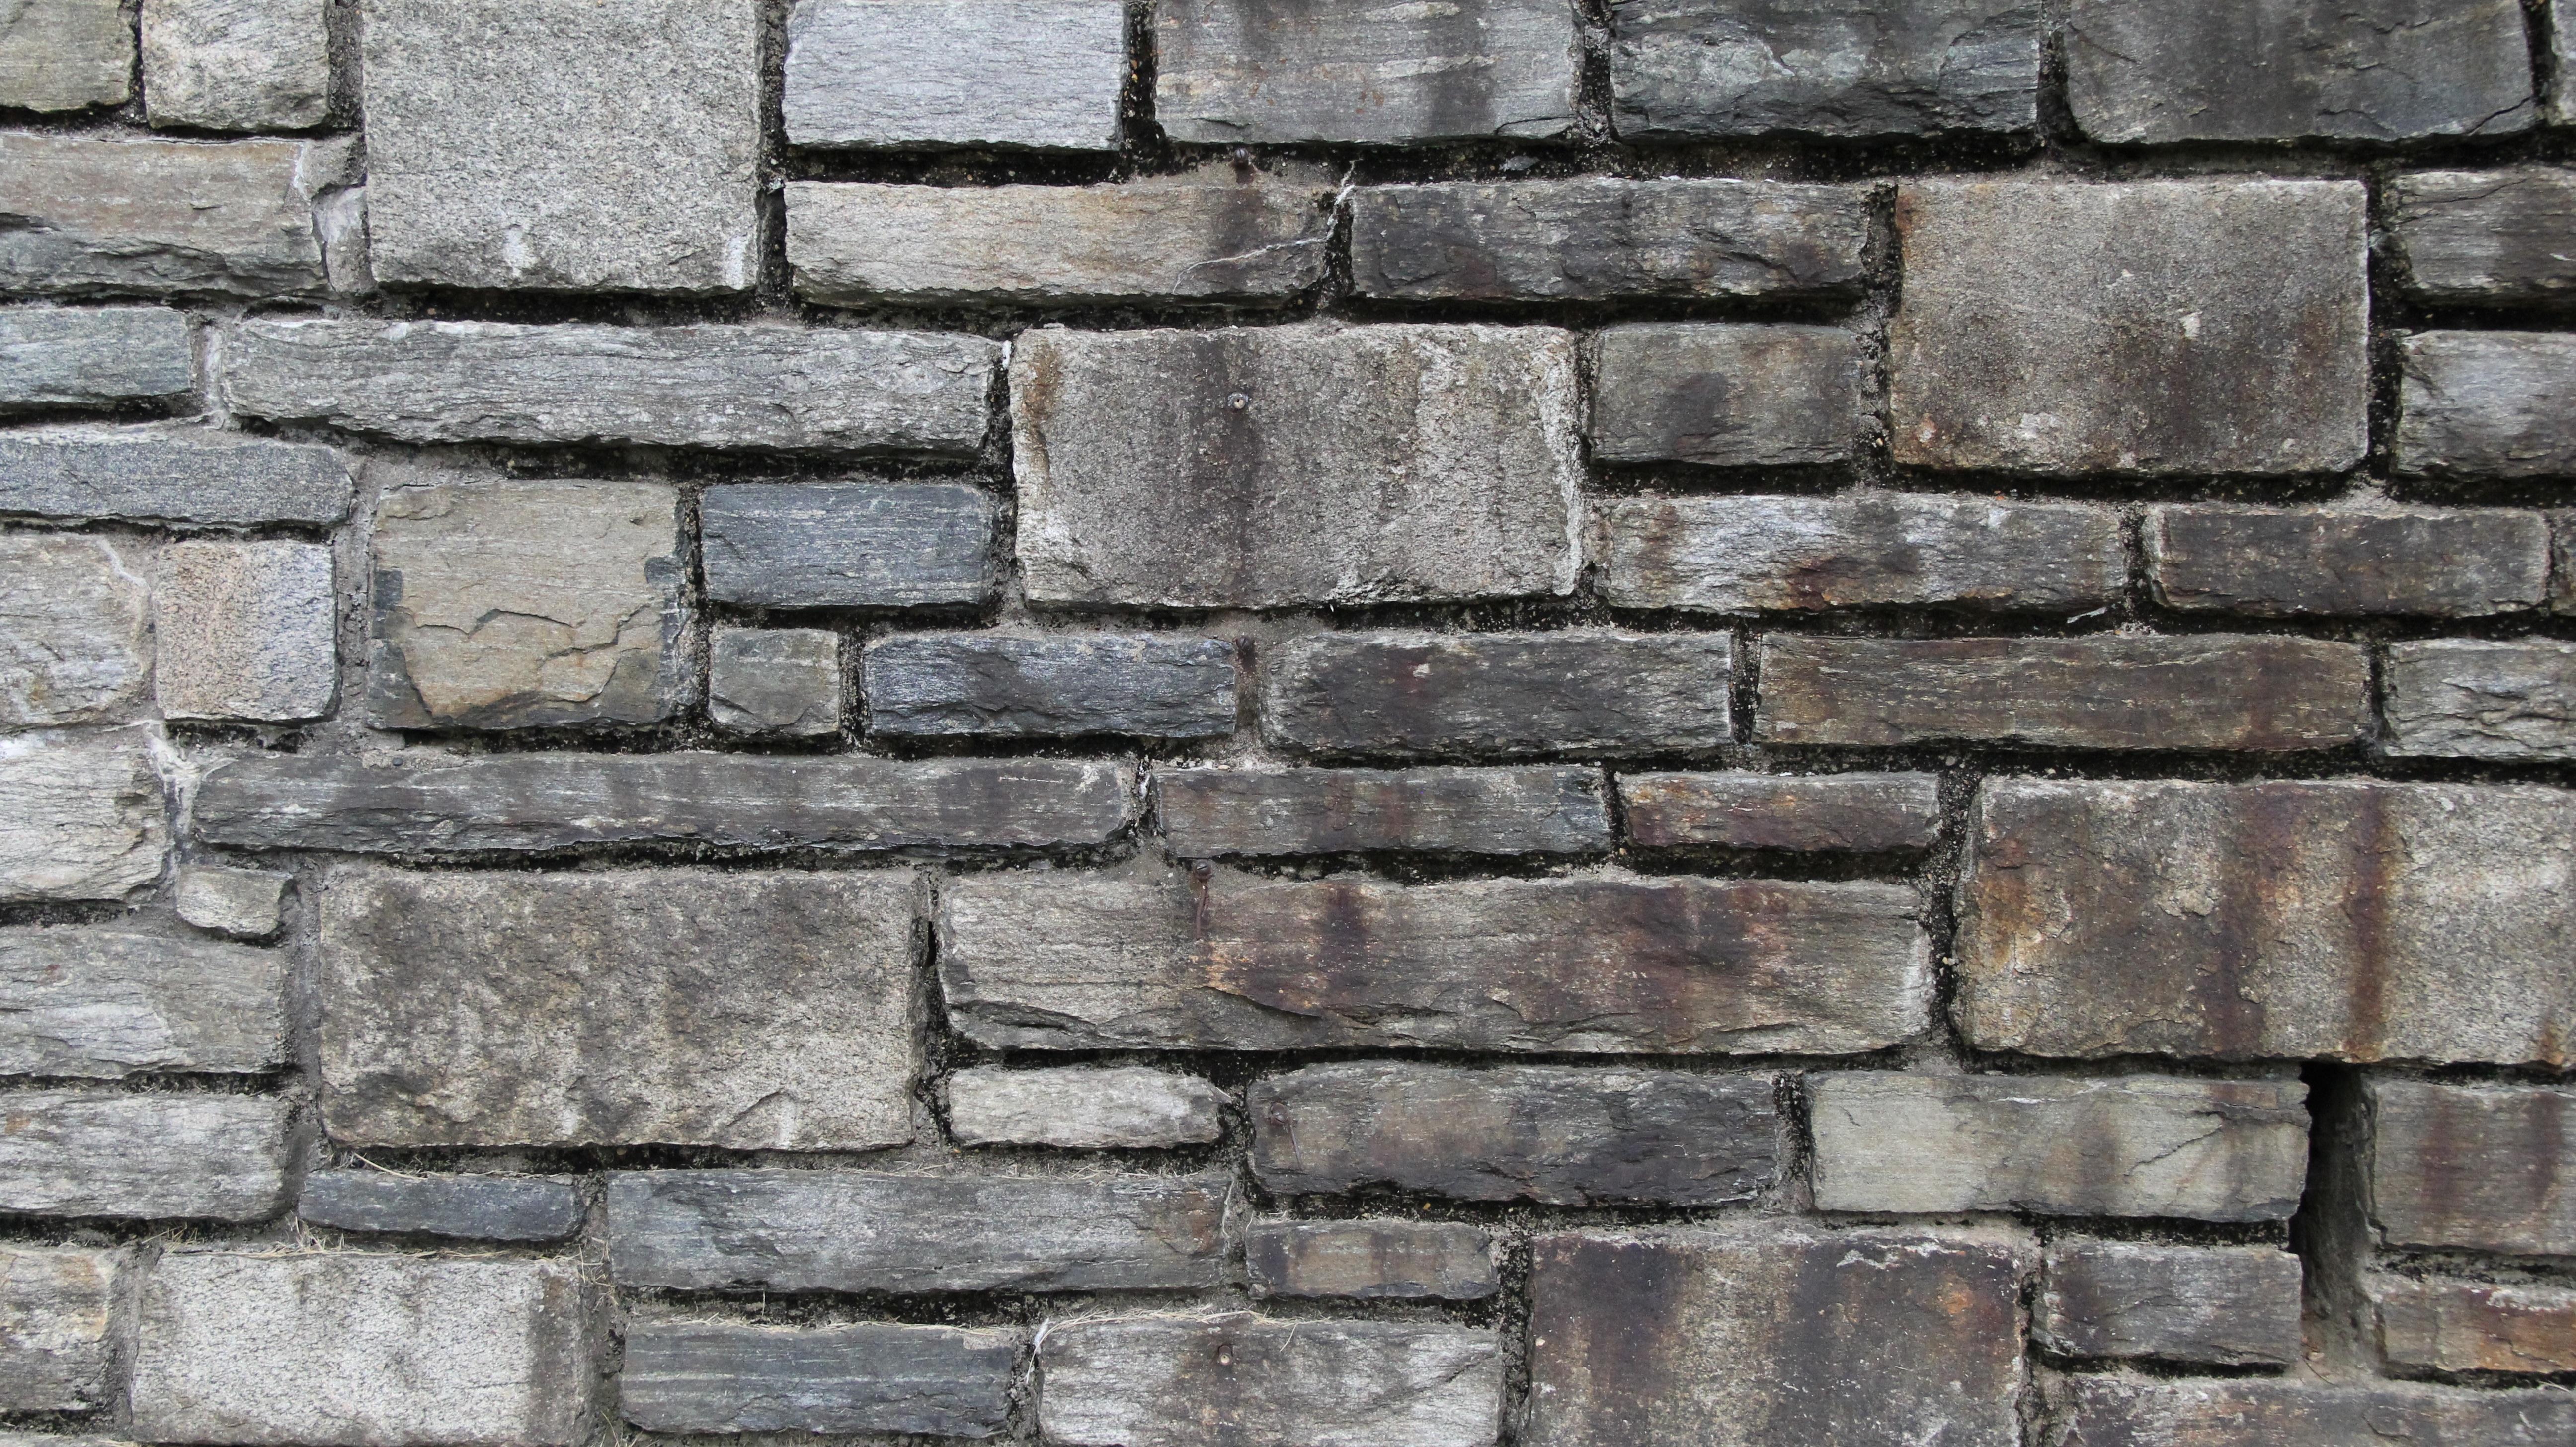 Fotos Gratis : Rock, Arquitectura, Textura, Piso, Guijarro